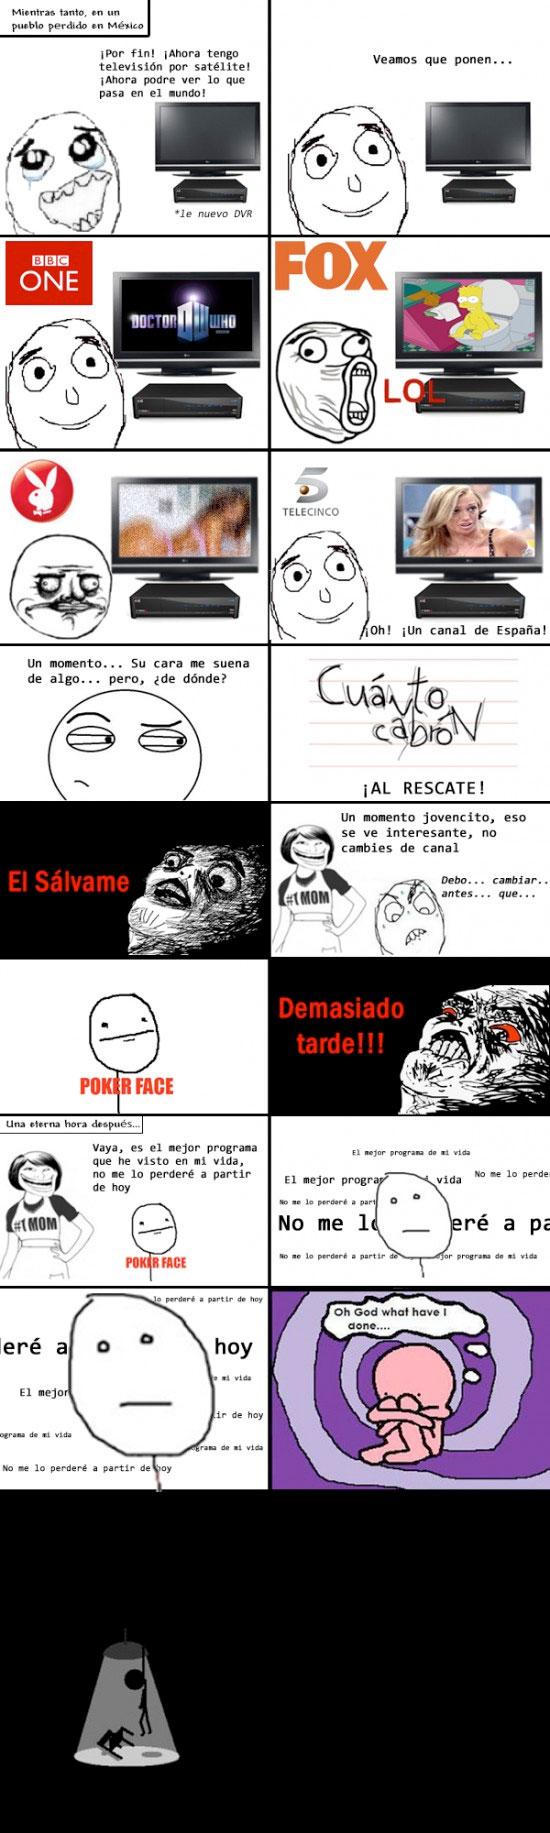 Oh_god_what_have_i_done - En una tierra lejana